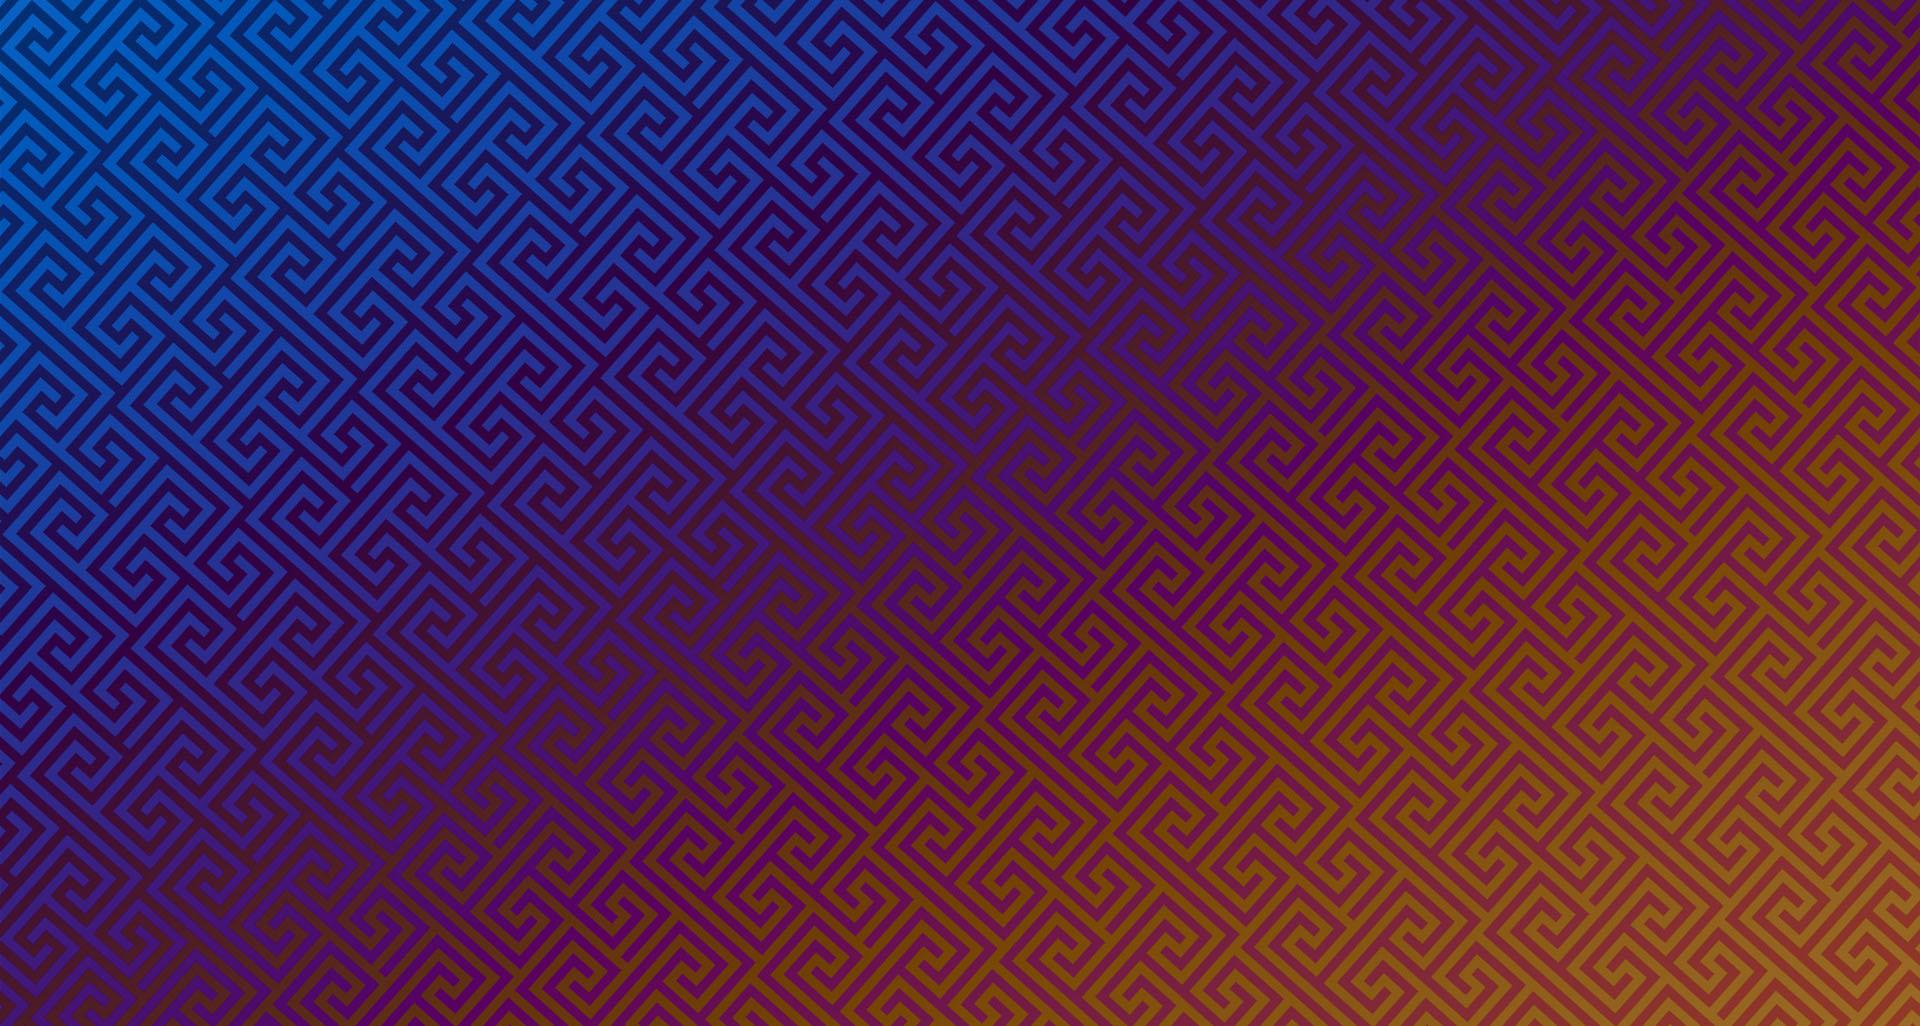 Fall Mobile Pattern Wallpapers Blue And Orange Wallpapers Pixelstalk Net